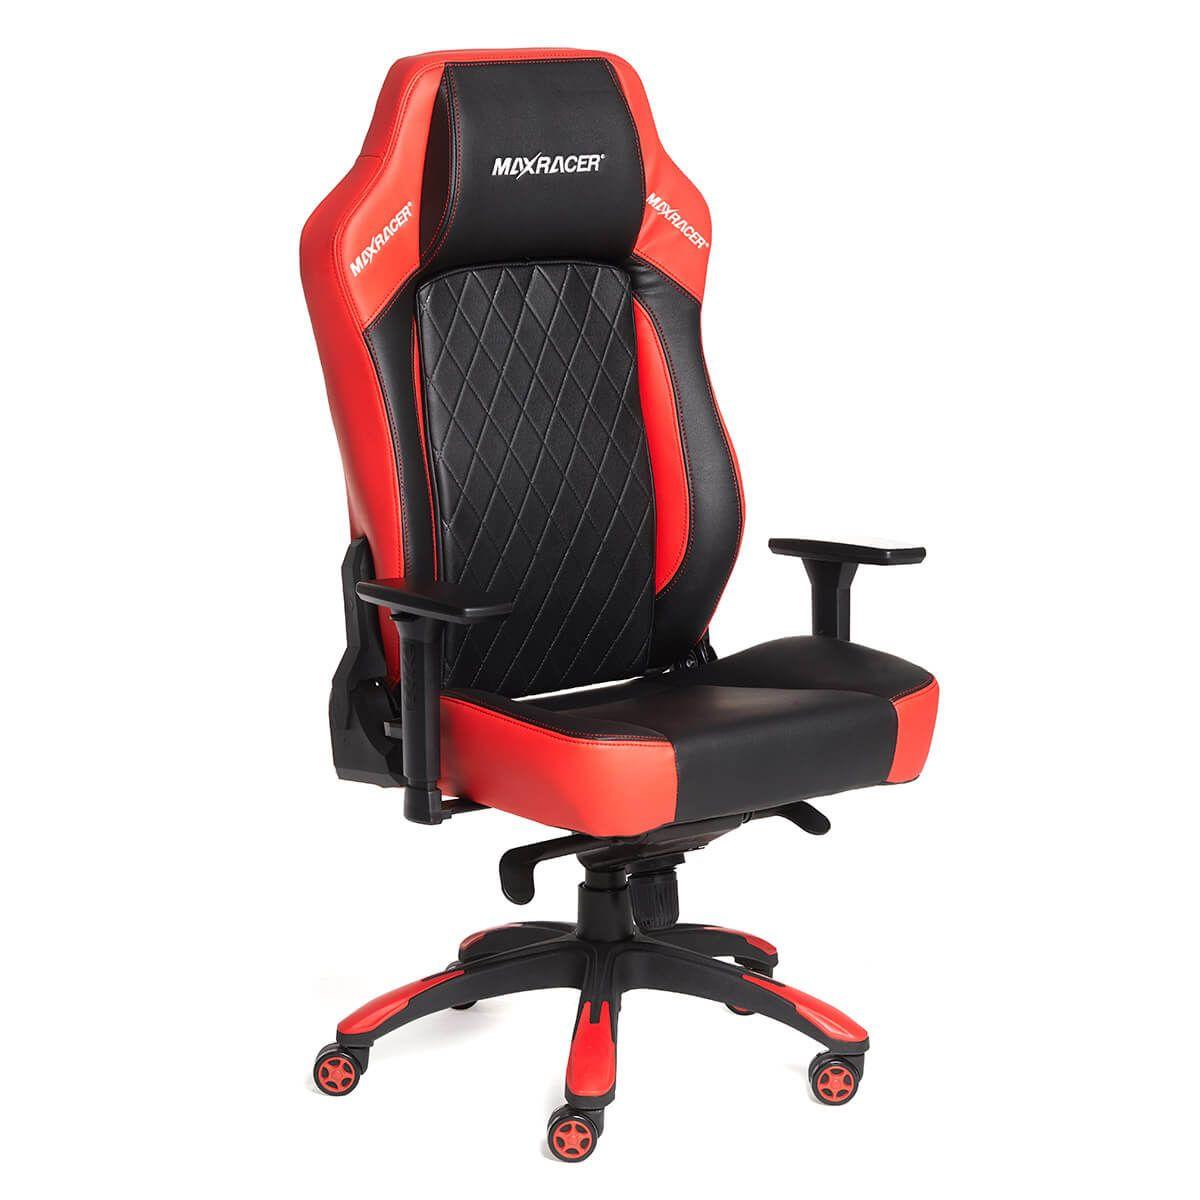 Cadeira Gamer MaxRacer Profissional Bunker Vermelha